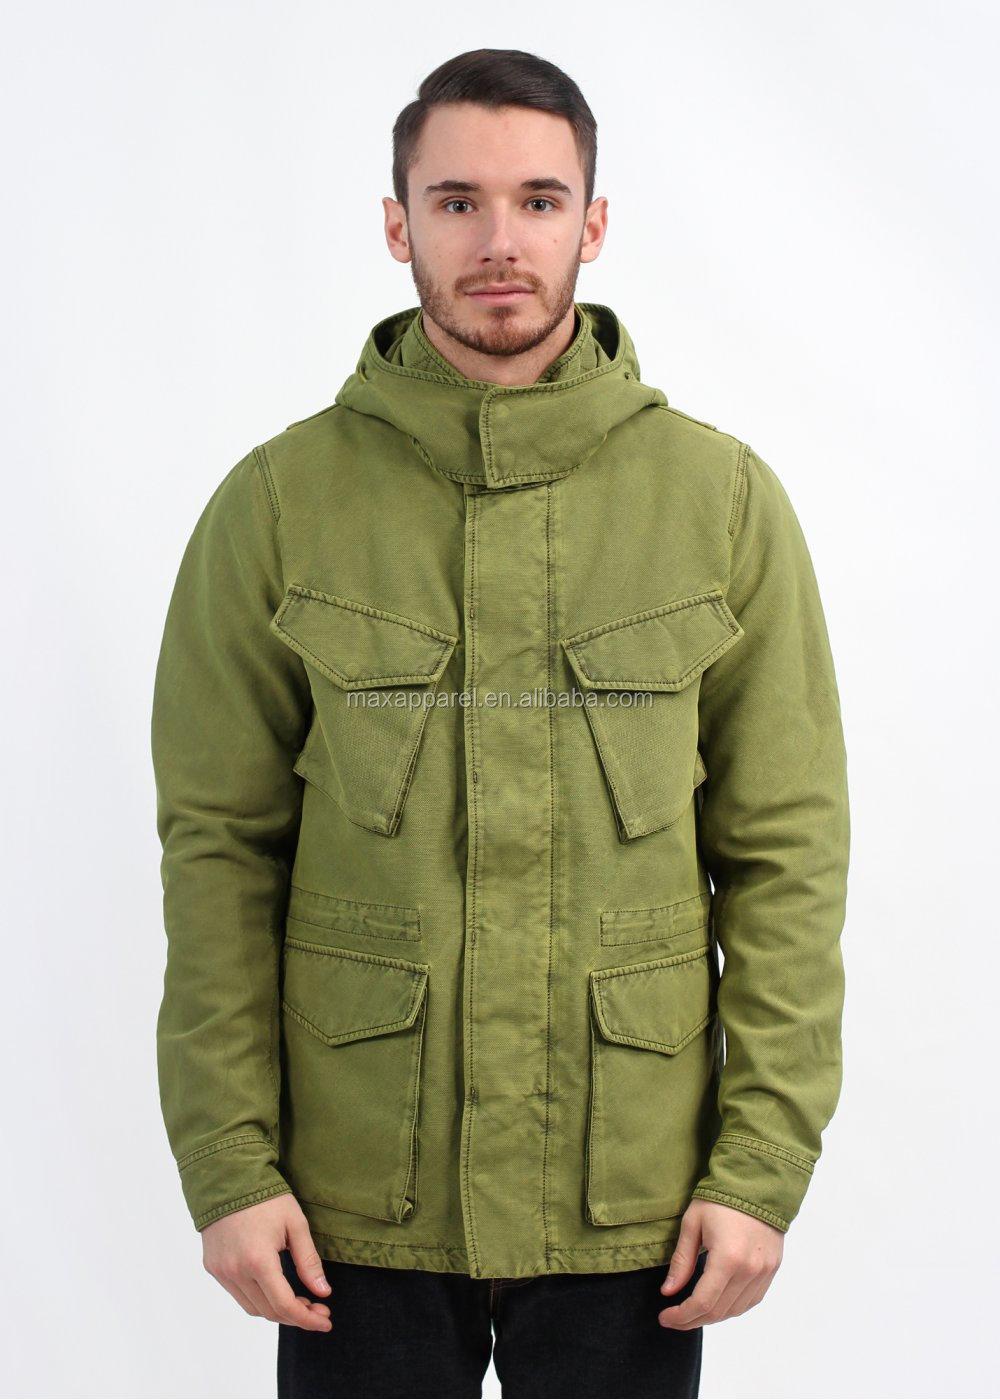 afdbcda3e 2015 Custom Made Eu Fashion Mens Cotton  Nylon Blend Field Jacket ...